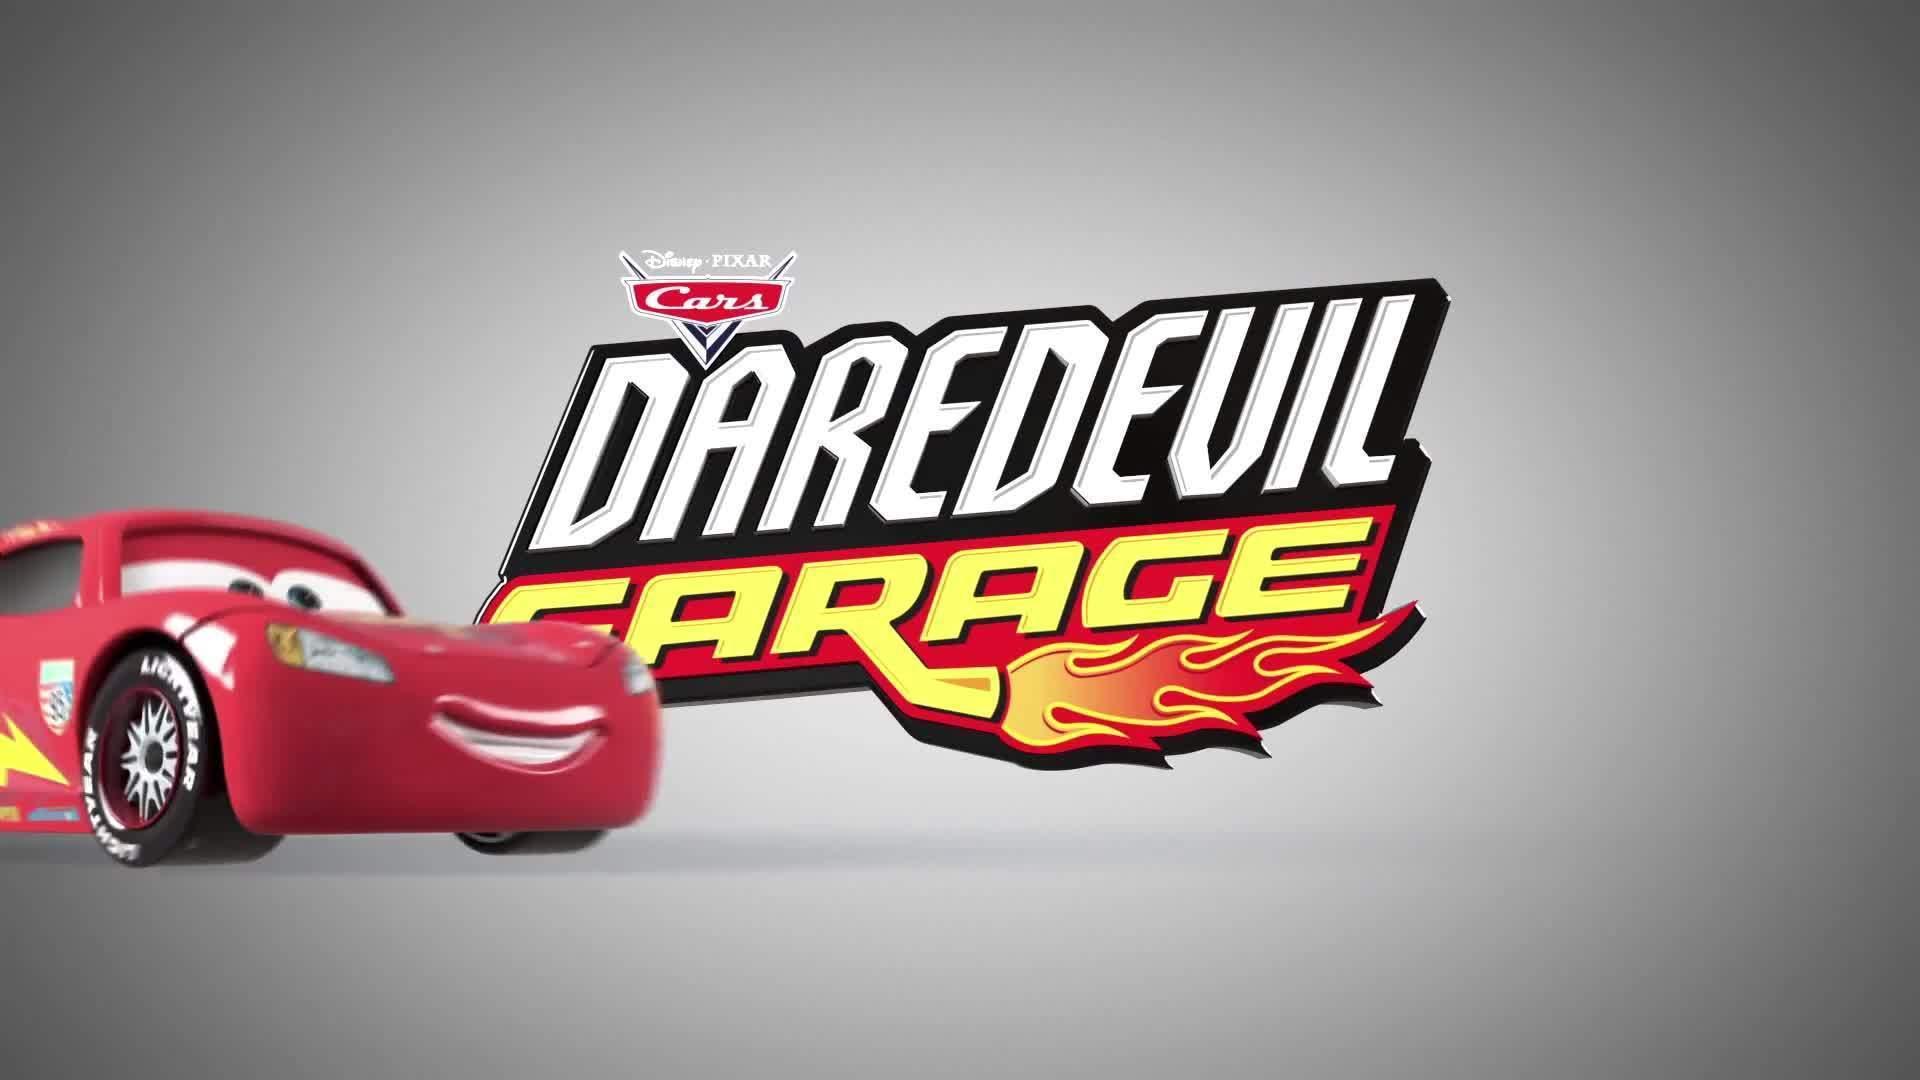 Cars Daredevil Garage: Silver Racers - The Kitchen